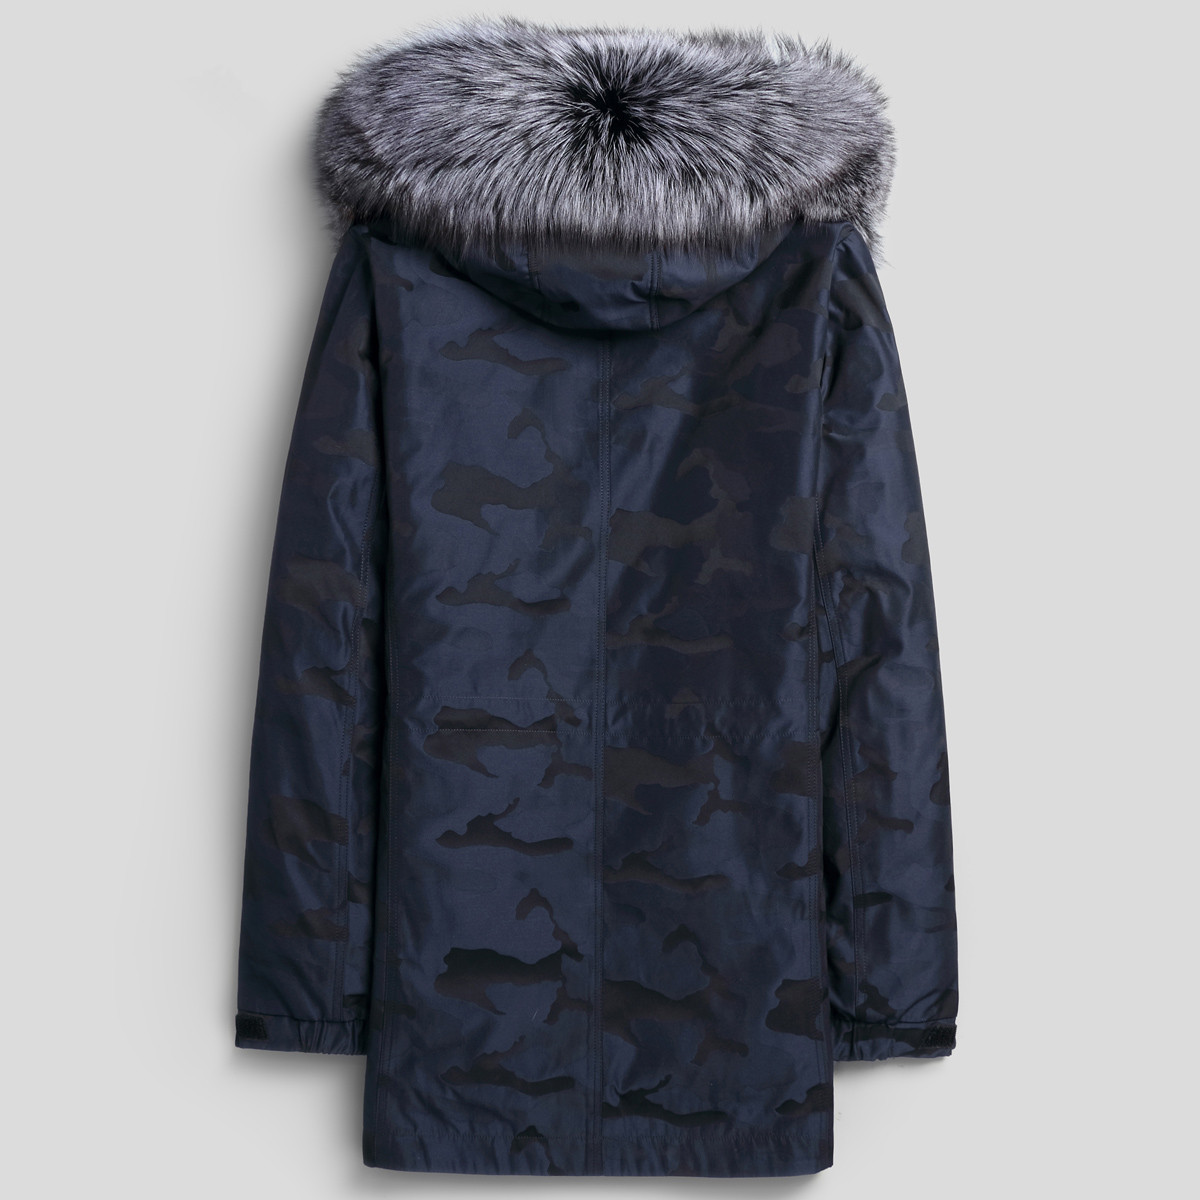 Parka Homme Winter Jacket Men Natural Mink Fur Liner Long Coat Mens Fox Fur Collar Parkas Overcoat LSY088382 Y1362